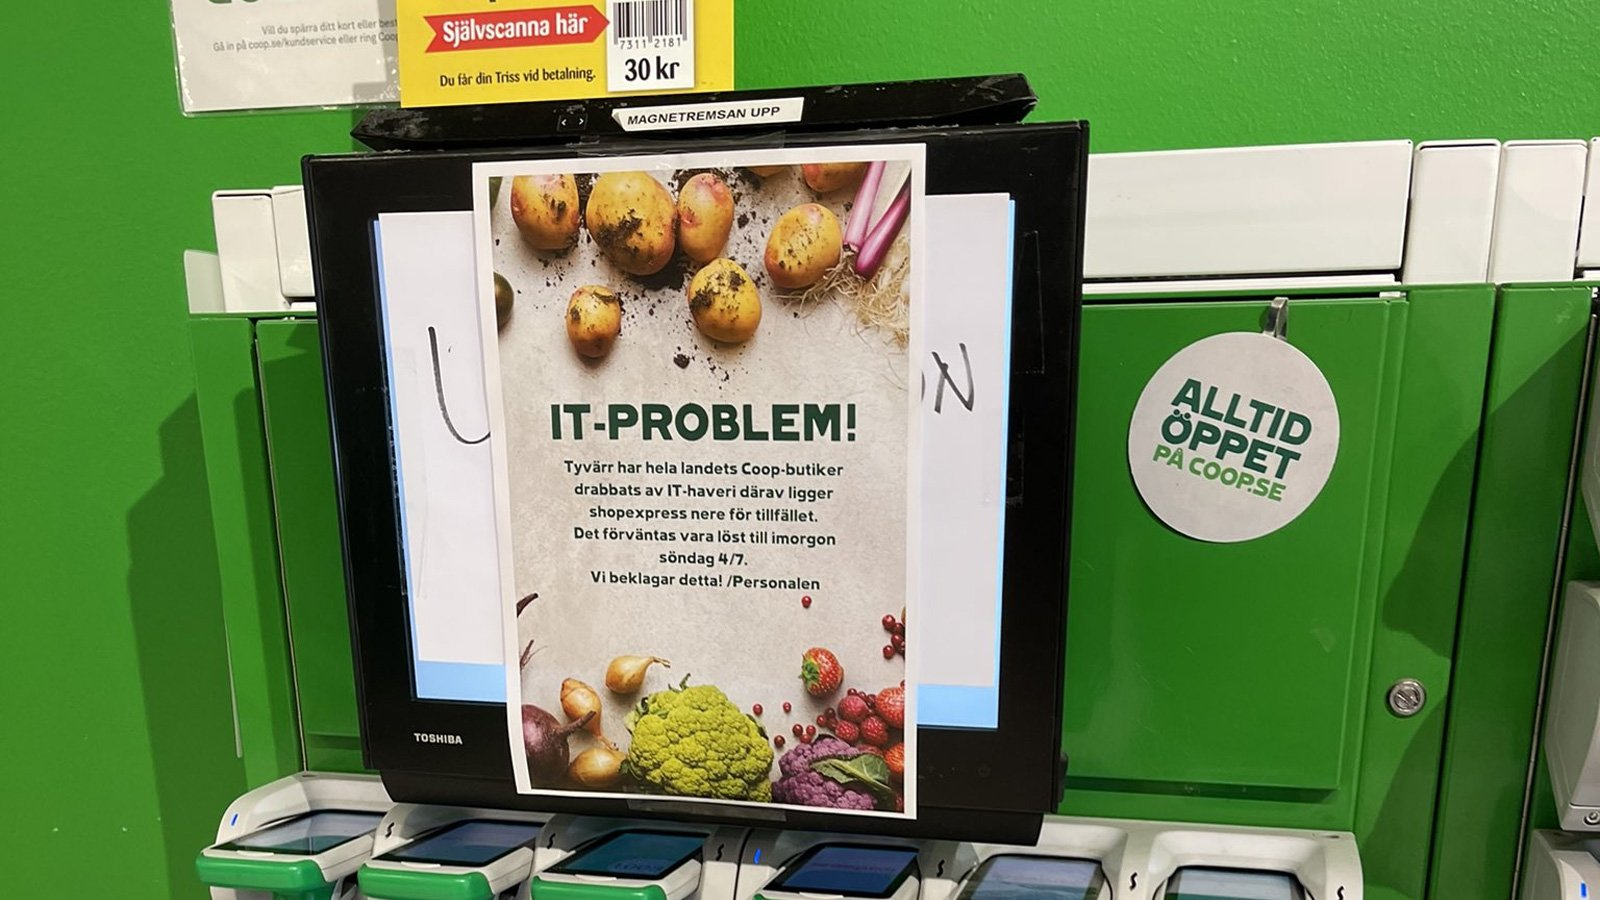 Coop supermarket closes 500 stores after Kaseya ransomware attack